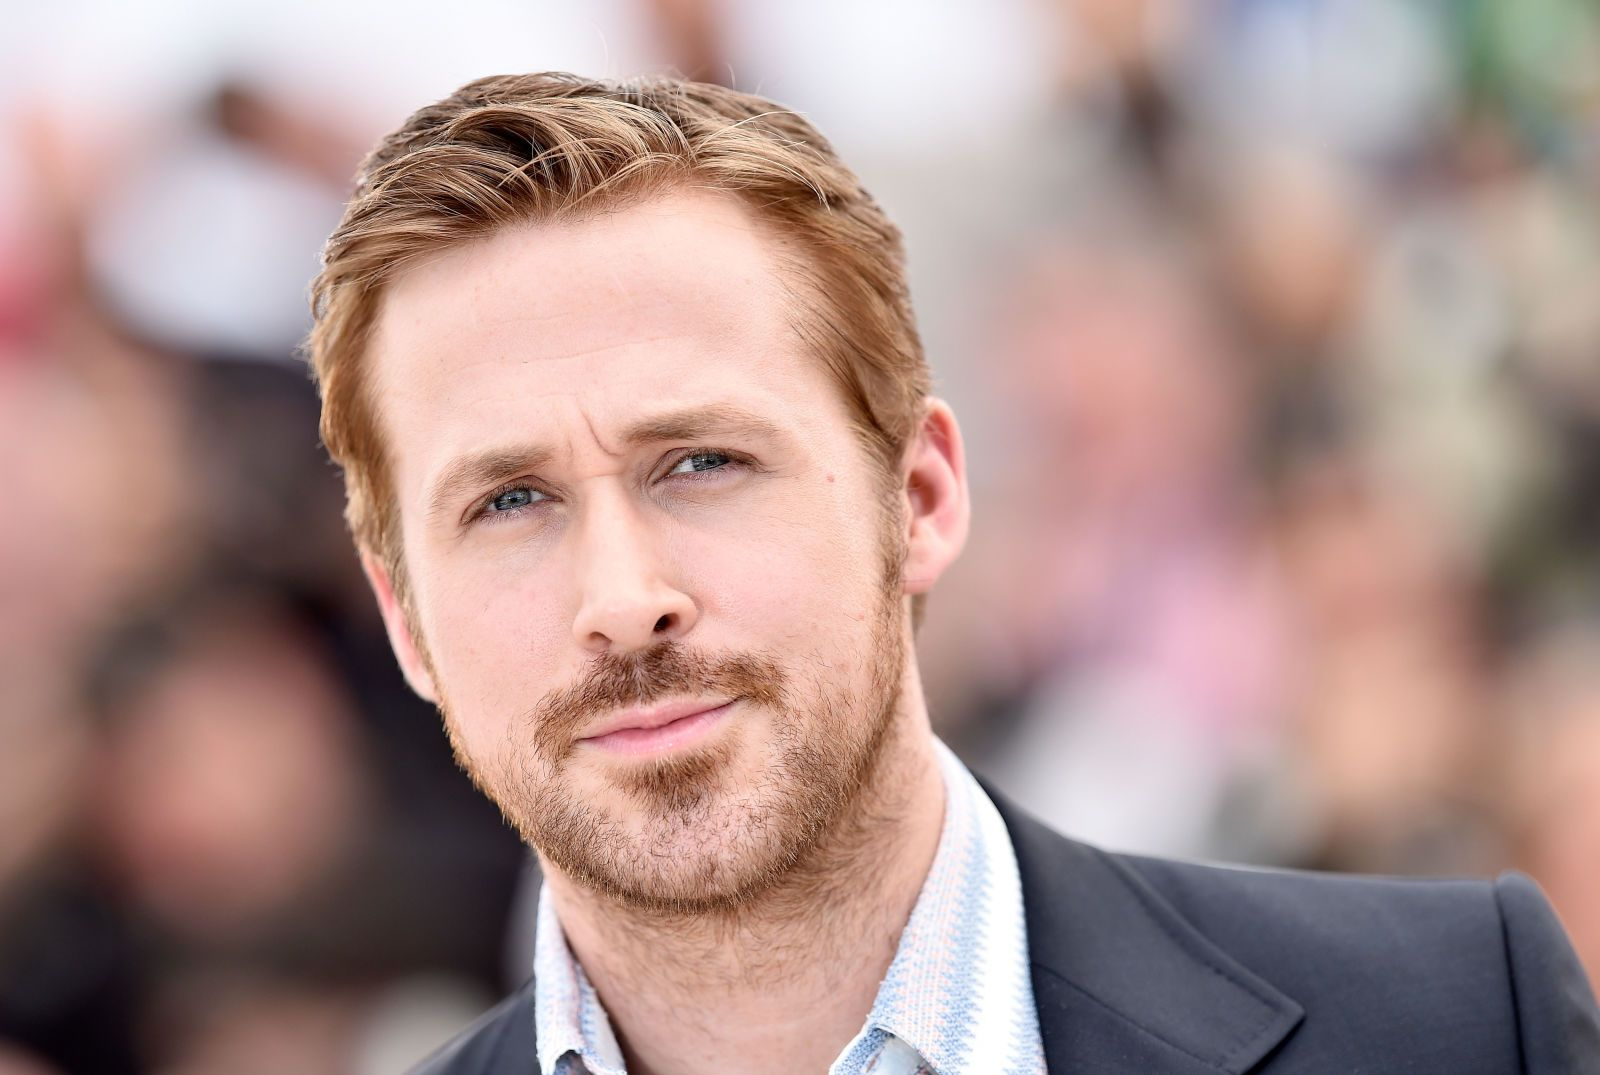 4 Things Ryan Gosling Did To Get His Photoshopped Body Ryan Gosling Ryan Gosling Quotes Actor